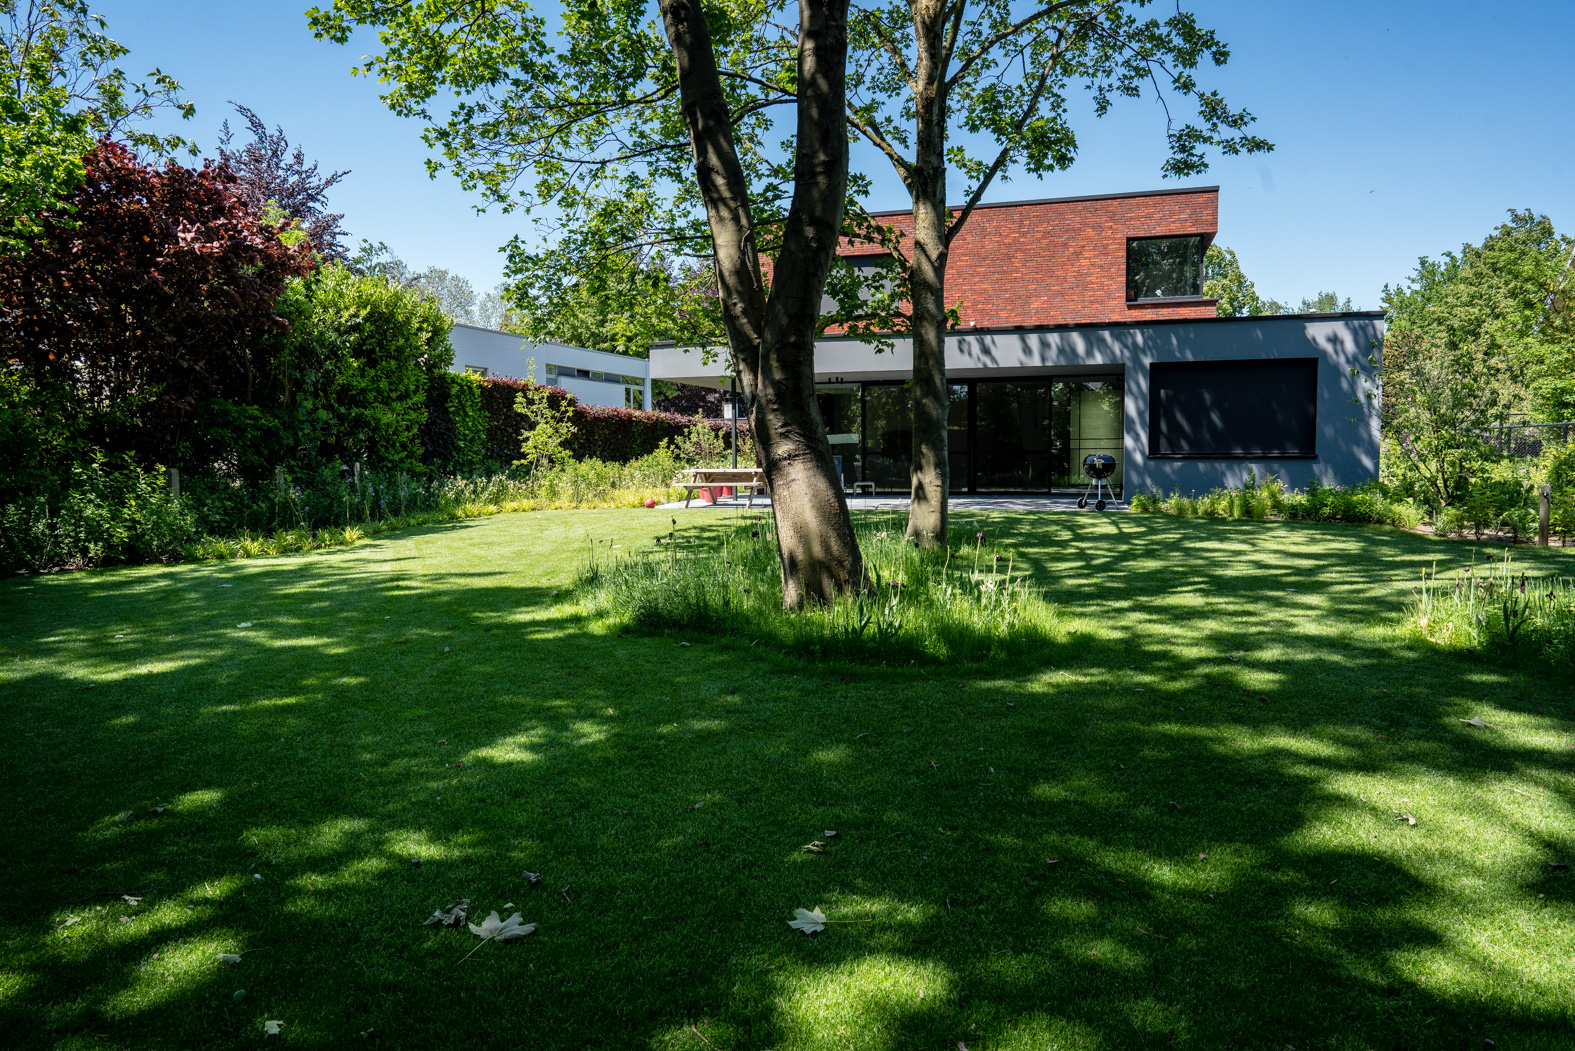 052021 WVV Hogerhuis U665 LOWRES24 | Baeyens & Beck architecten Gent | architect nieuwbouw renovatie interieur | high end | architectenbureau